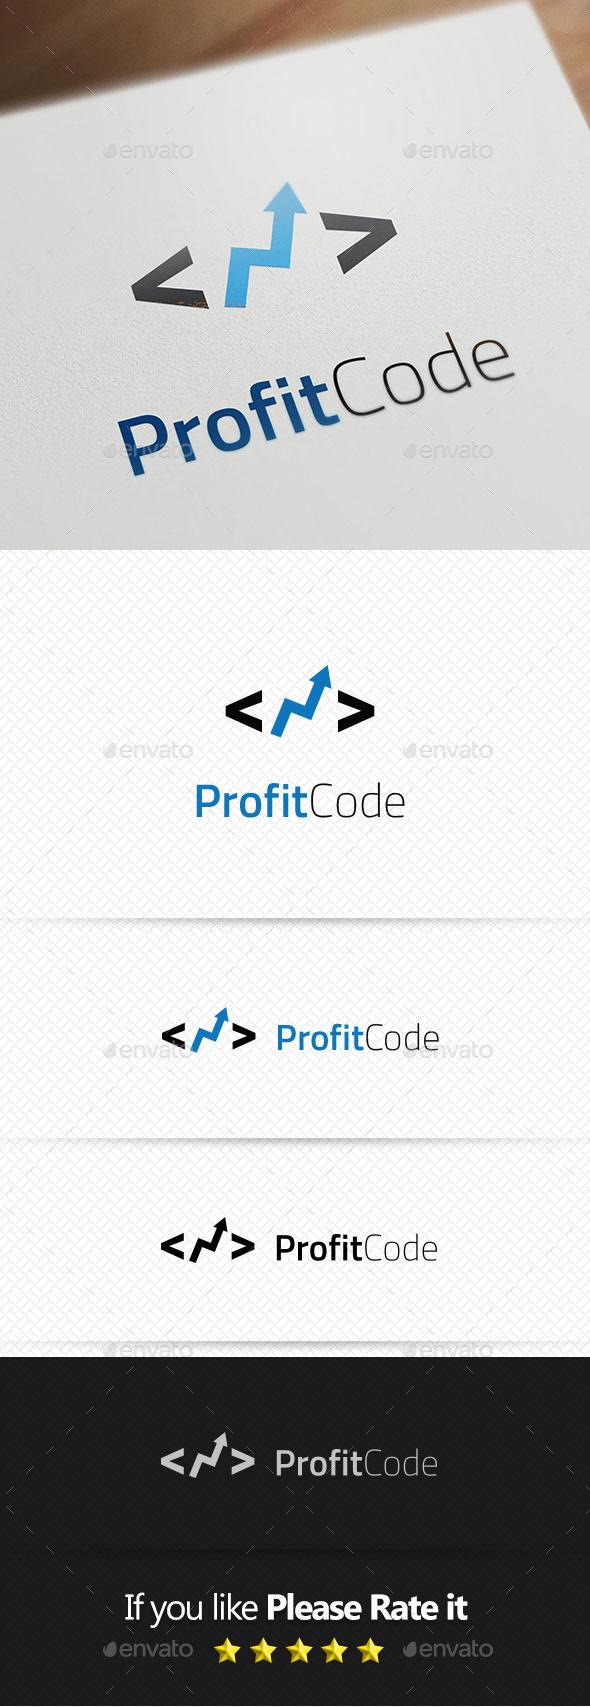 GraphicRiver Profit Code Logo Templates 10509059